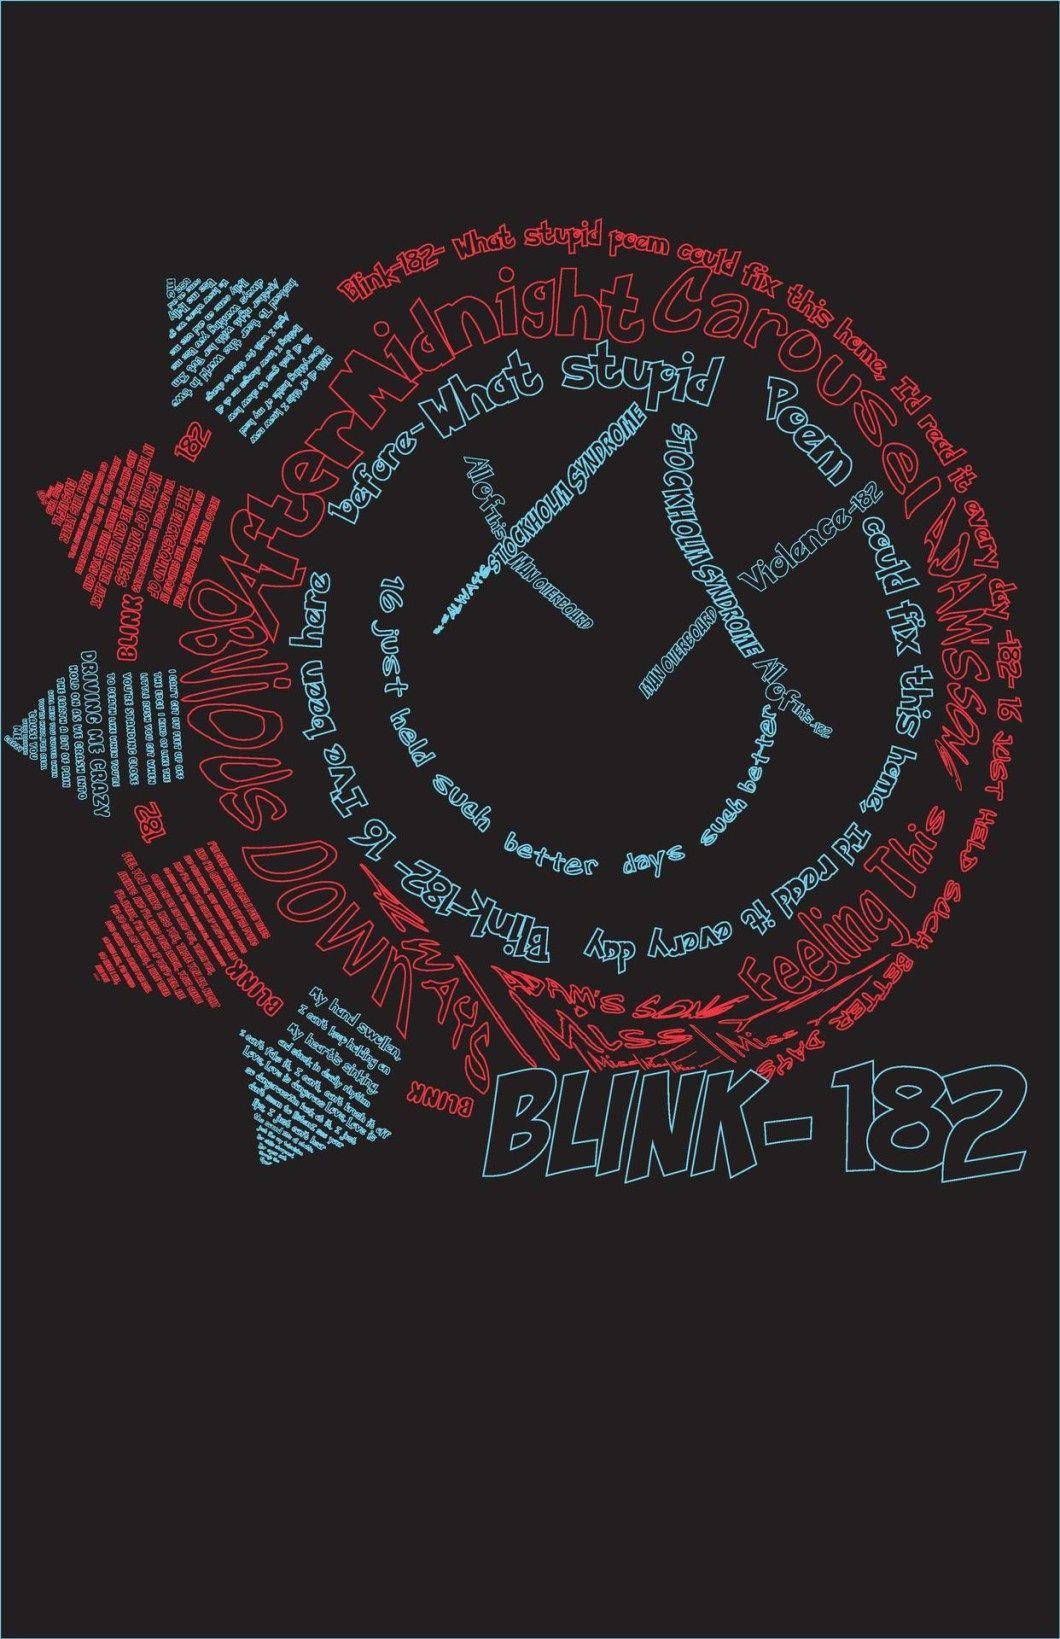 Blink 182 Wallpapers   Top Blink 182 Backgrounds 1060x1639